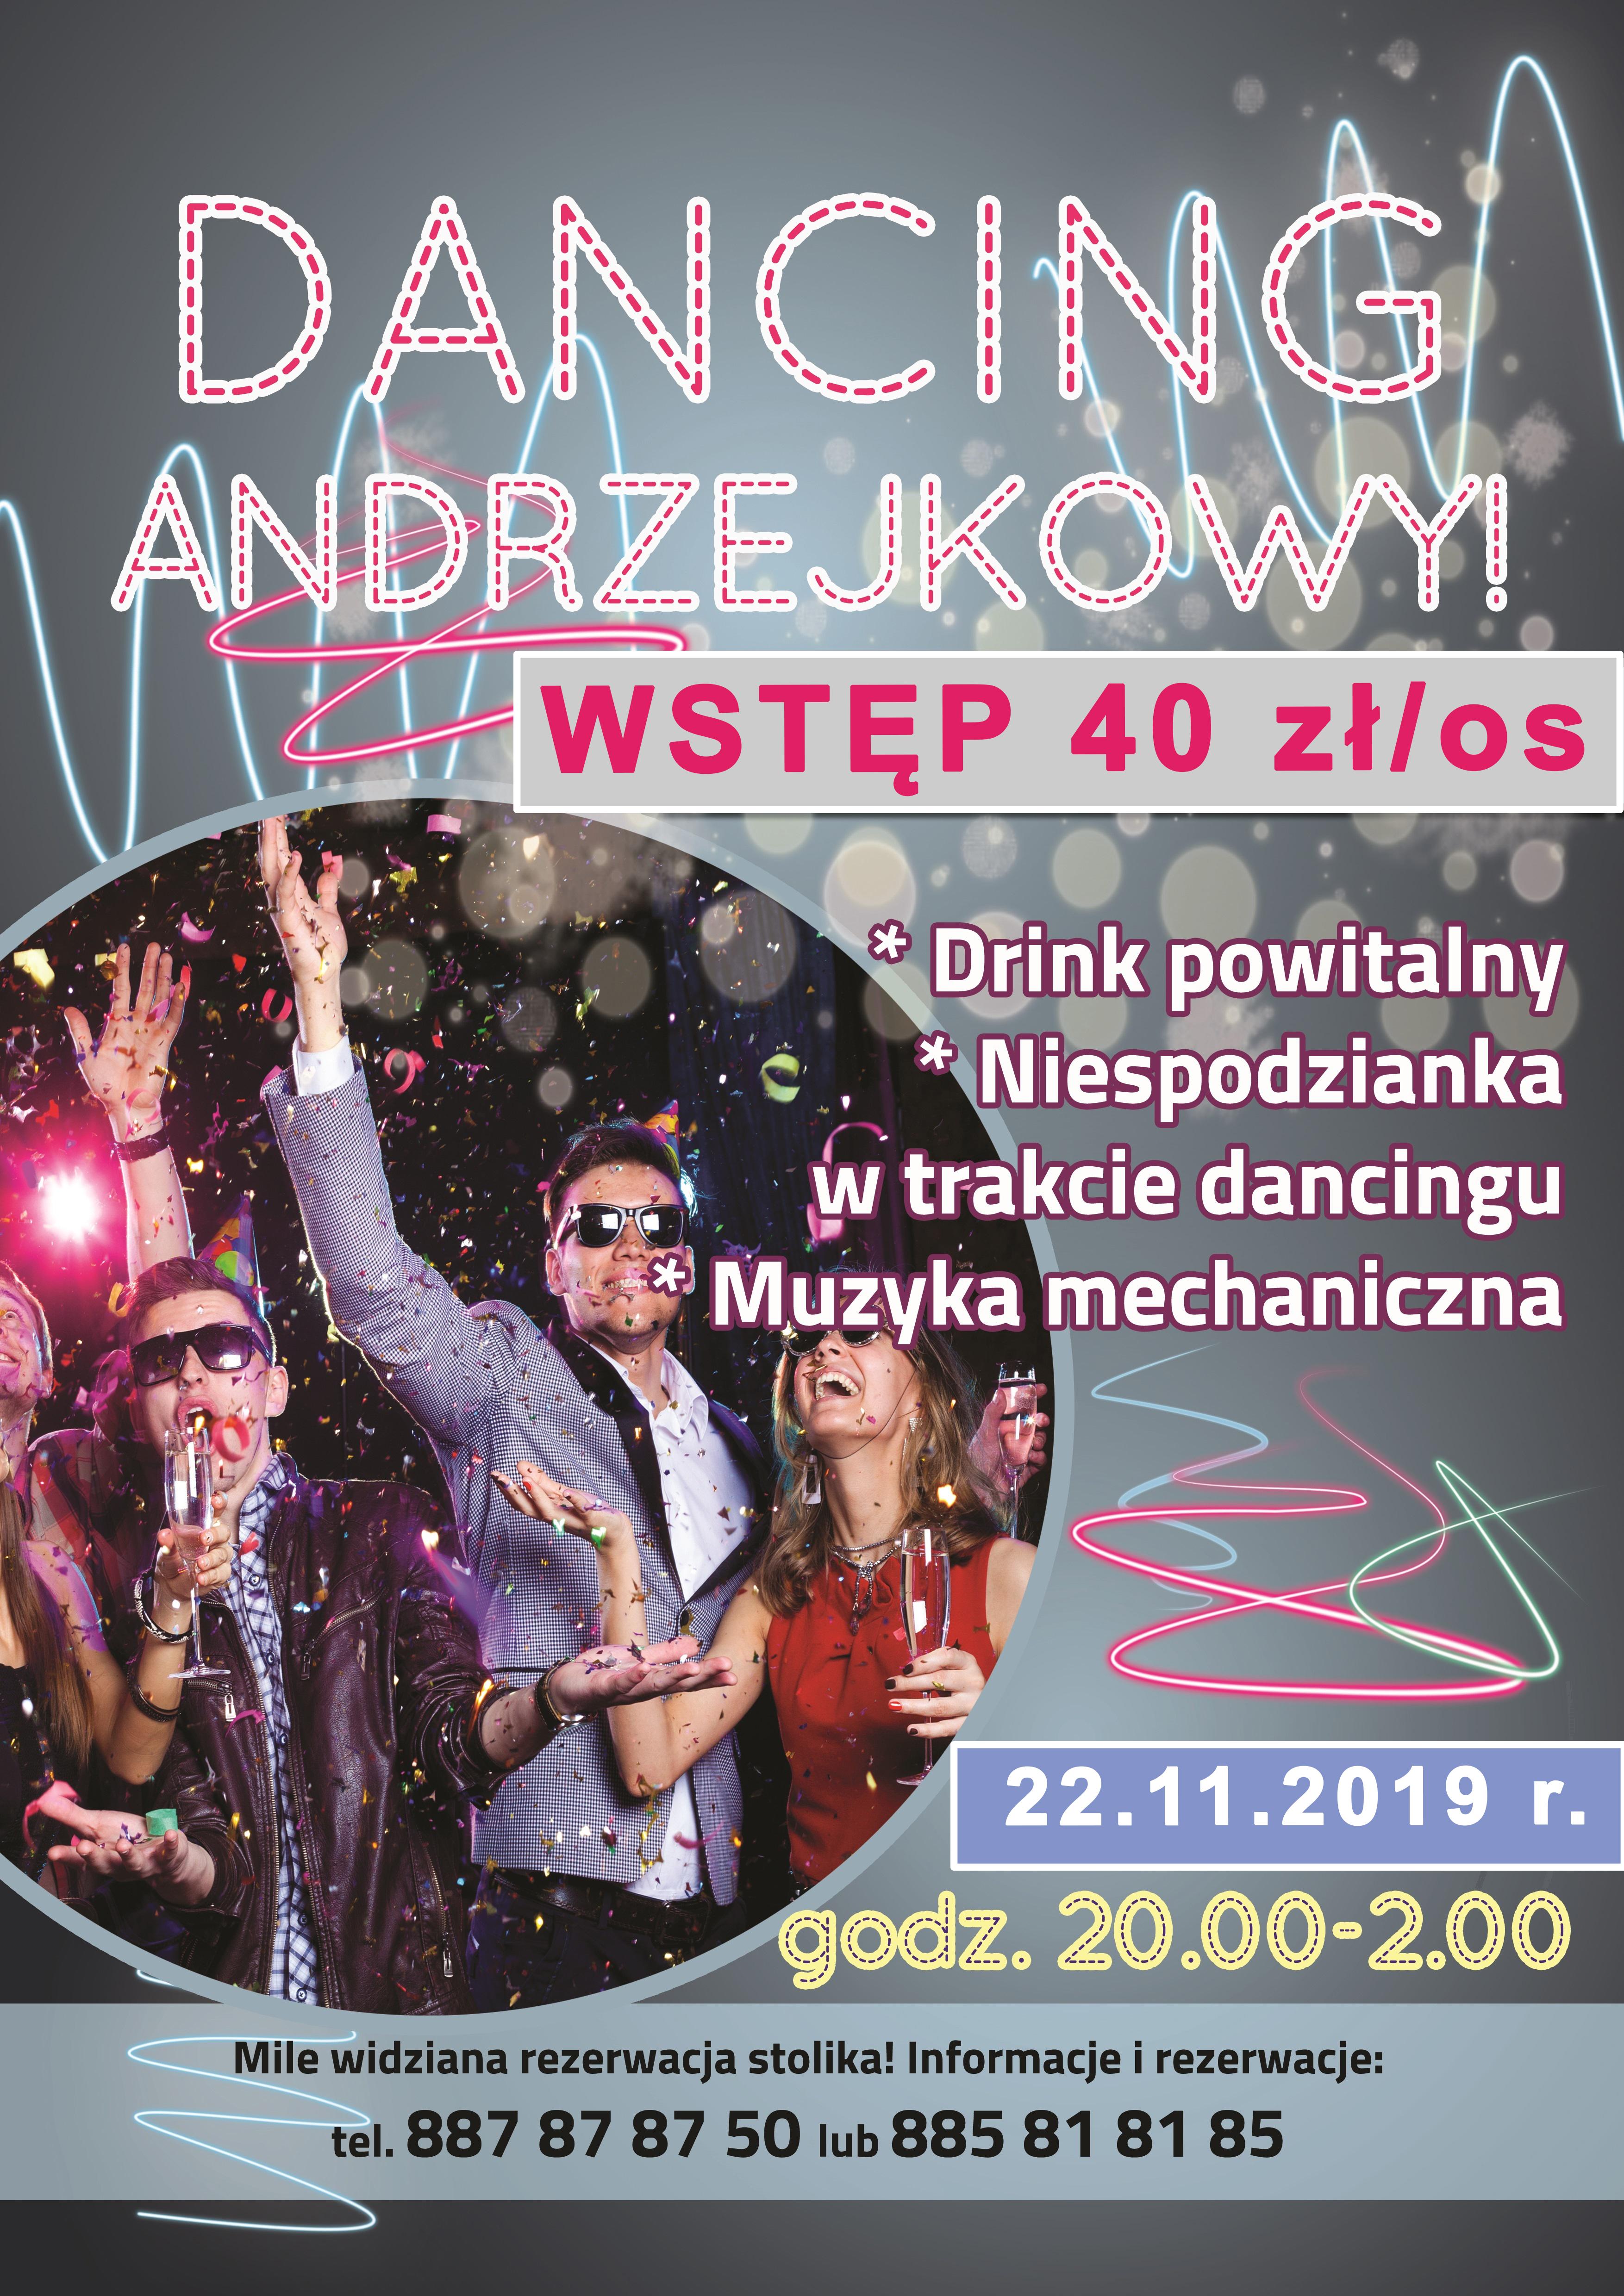 http://m.eranova.pl/2019/10/orig/dancing-andrzejkow2017y-edyta-3101.jpg